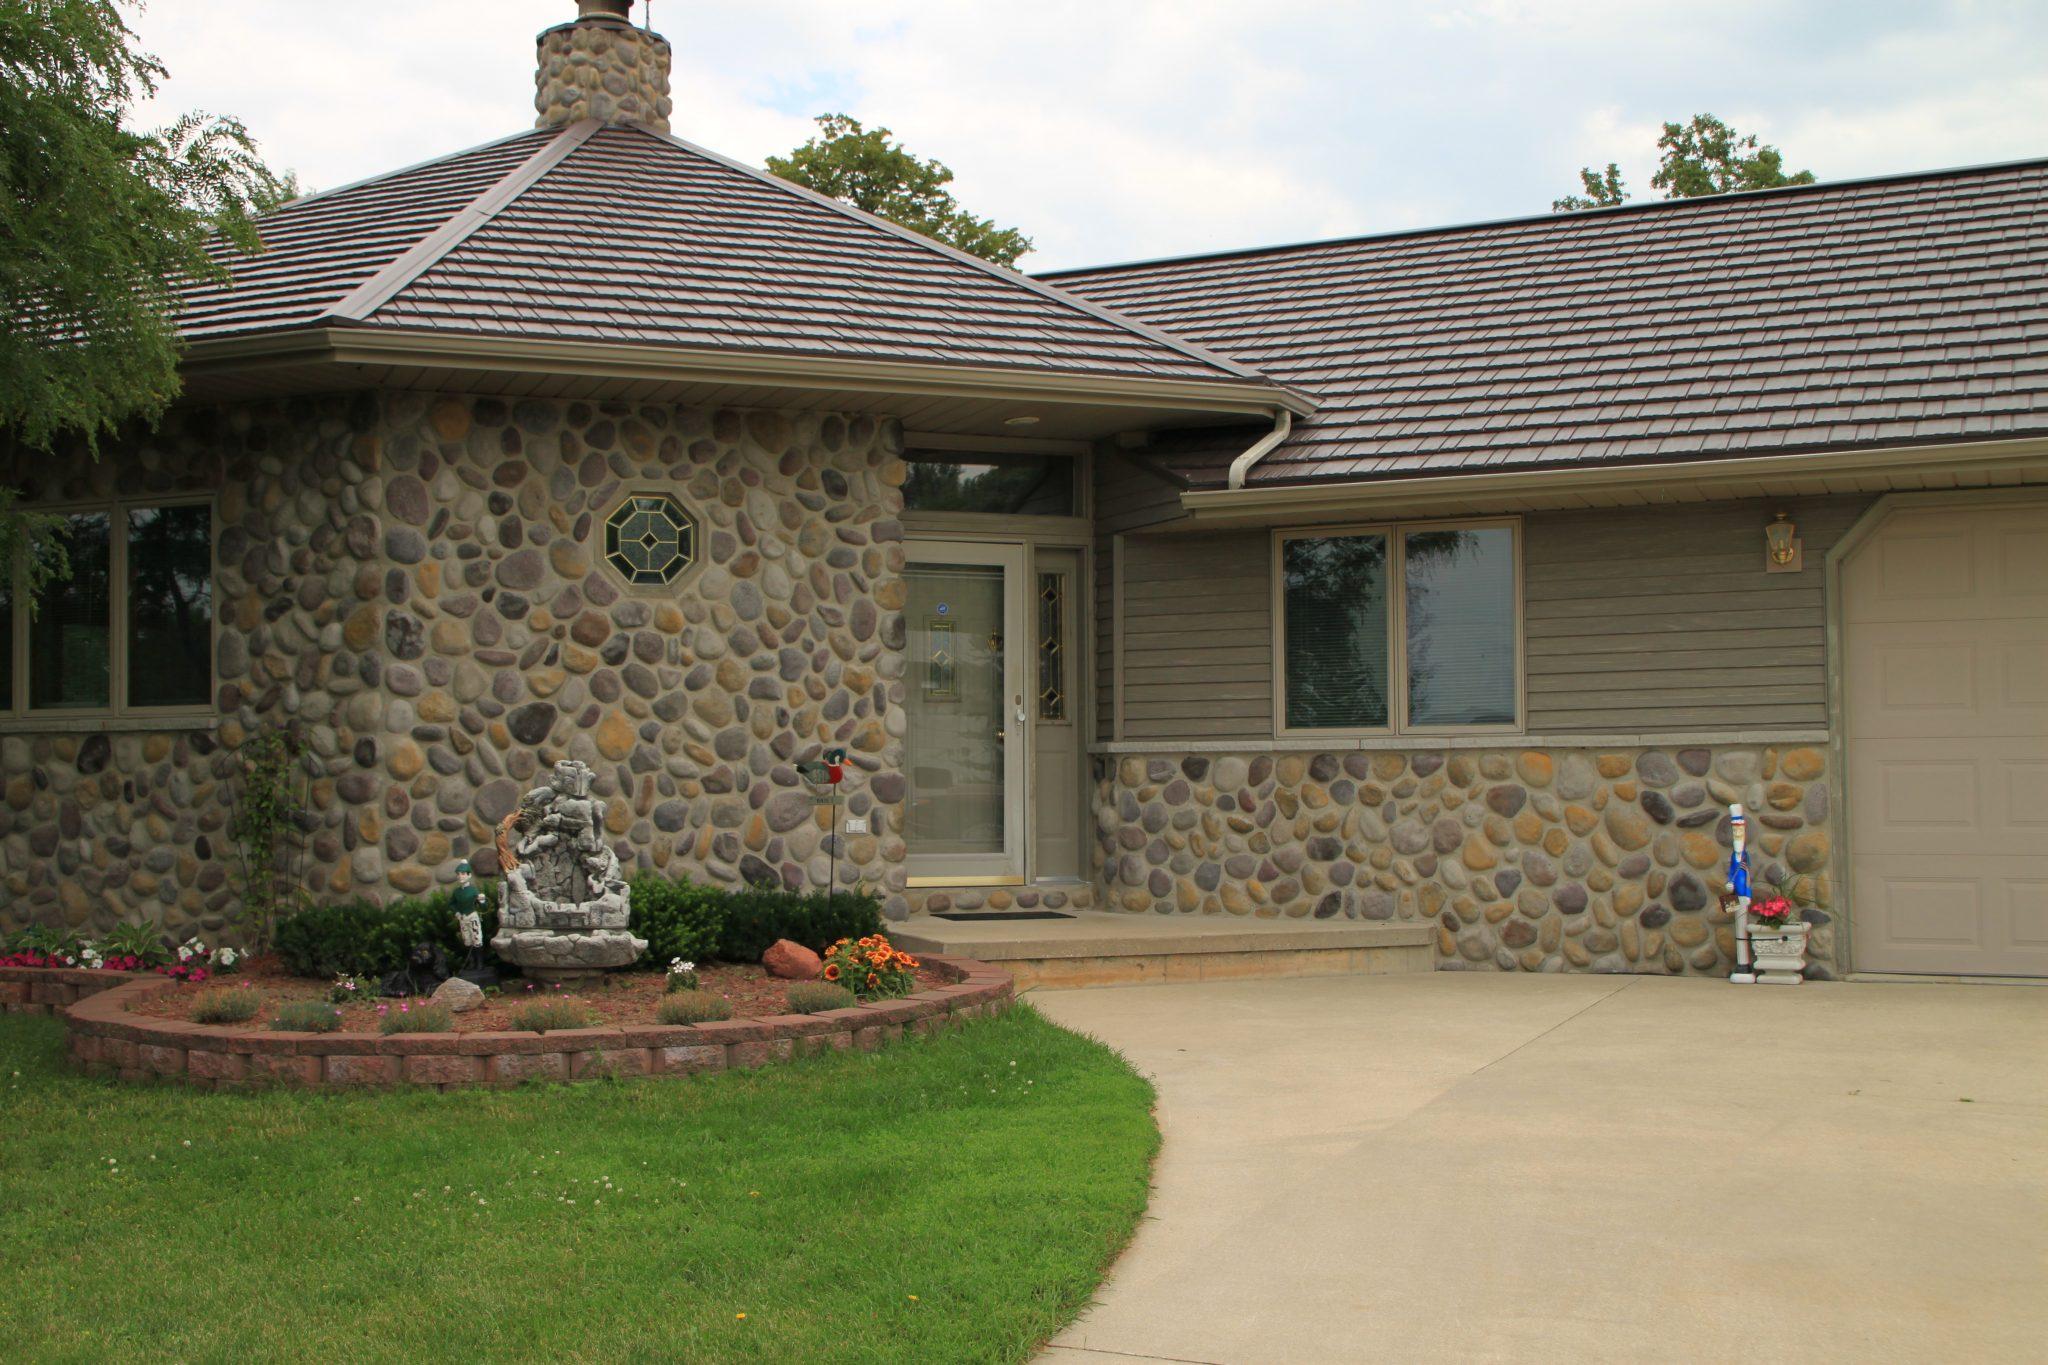 Metal Roofing vs. Shingles|